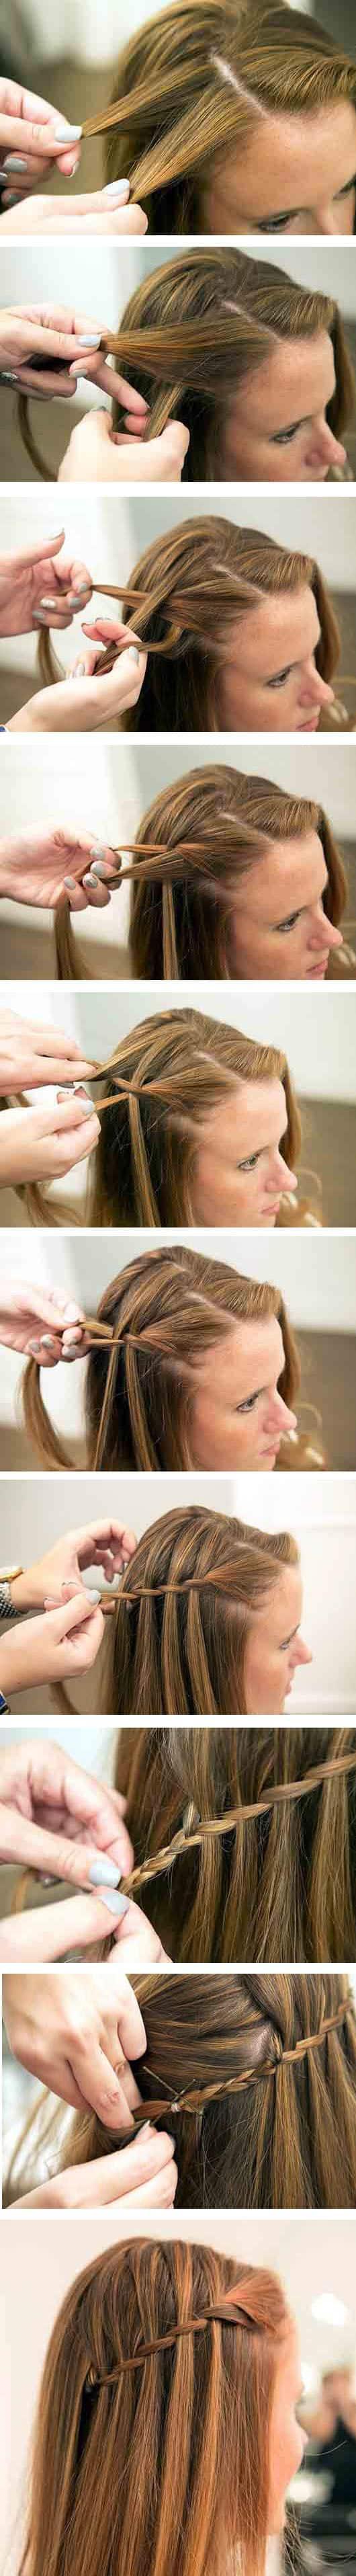 peinado-facil-para-ninas